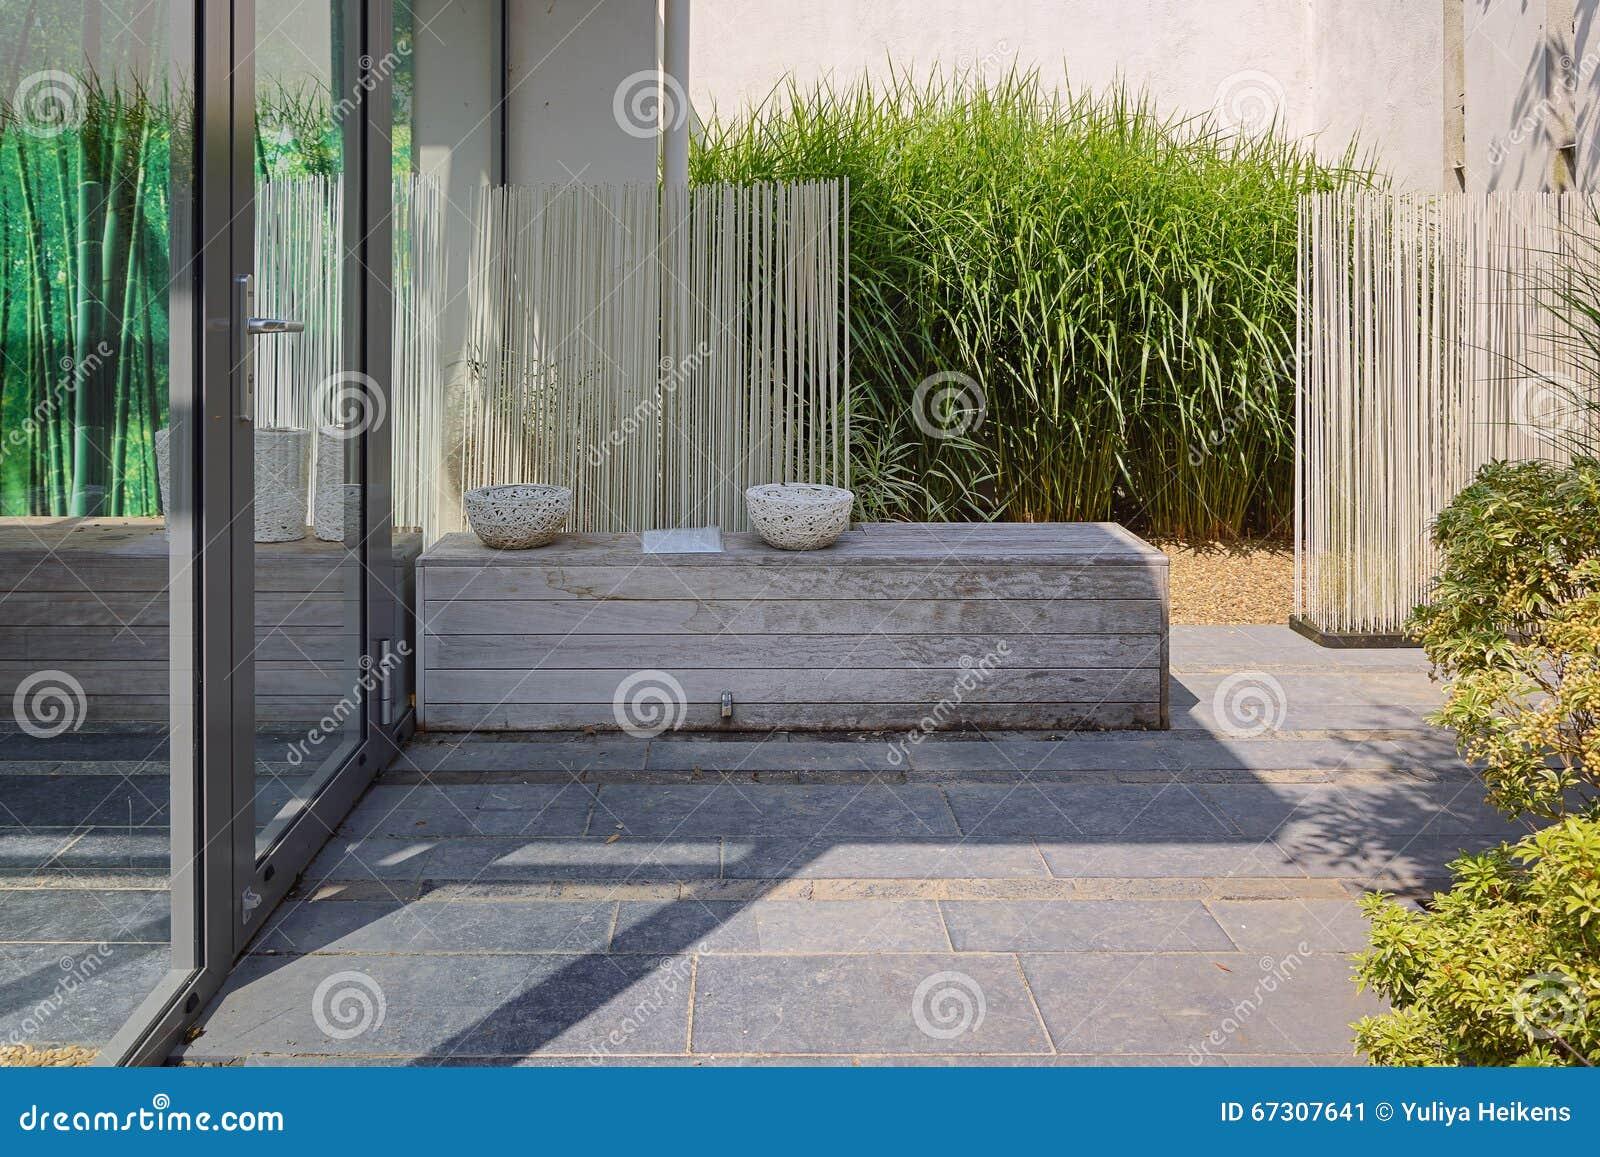 Mooi tuinidee redactionele foto afbeelding 67307641 - Openlucht tuin idee ...